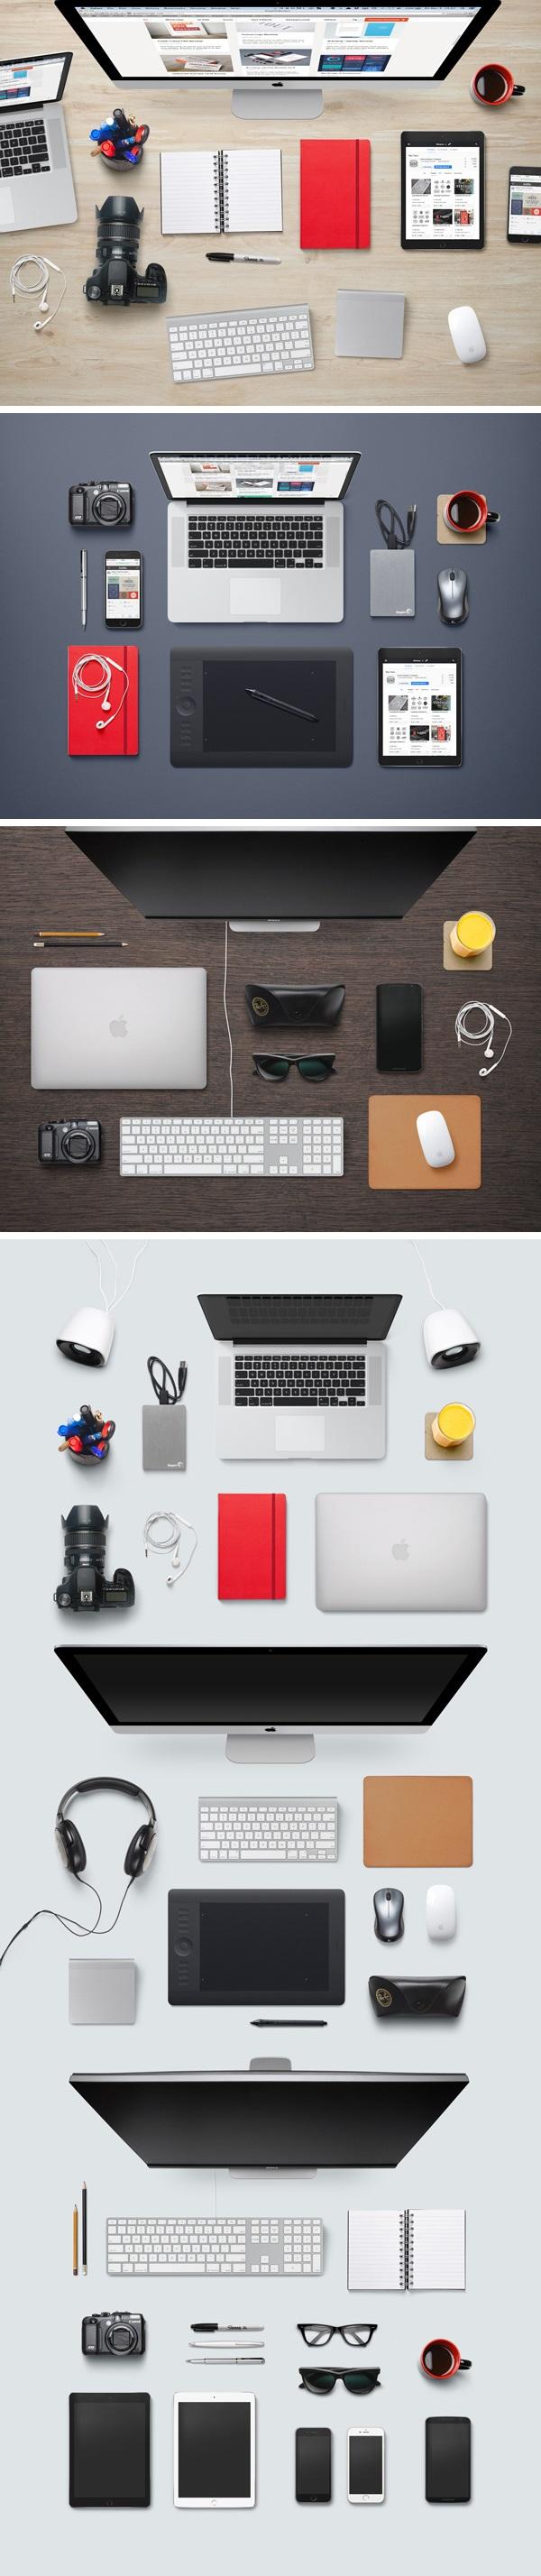 crear escenarios de escritorios